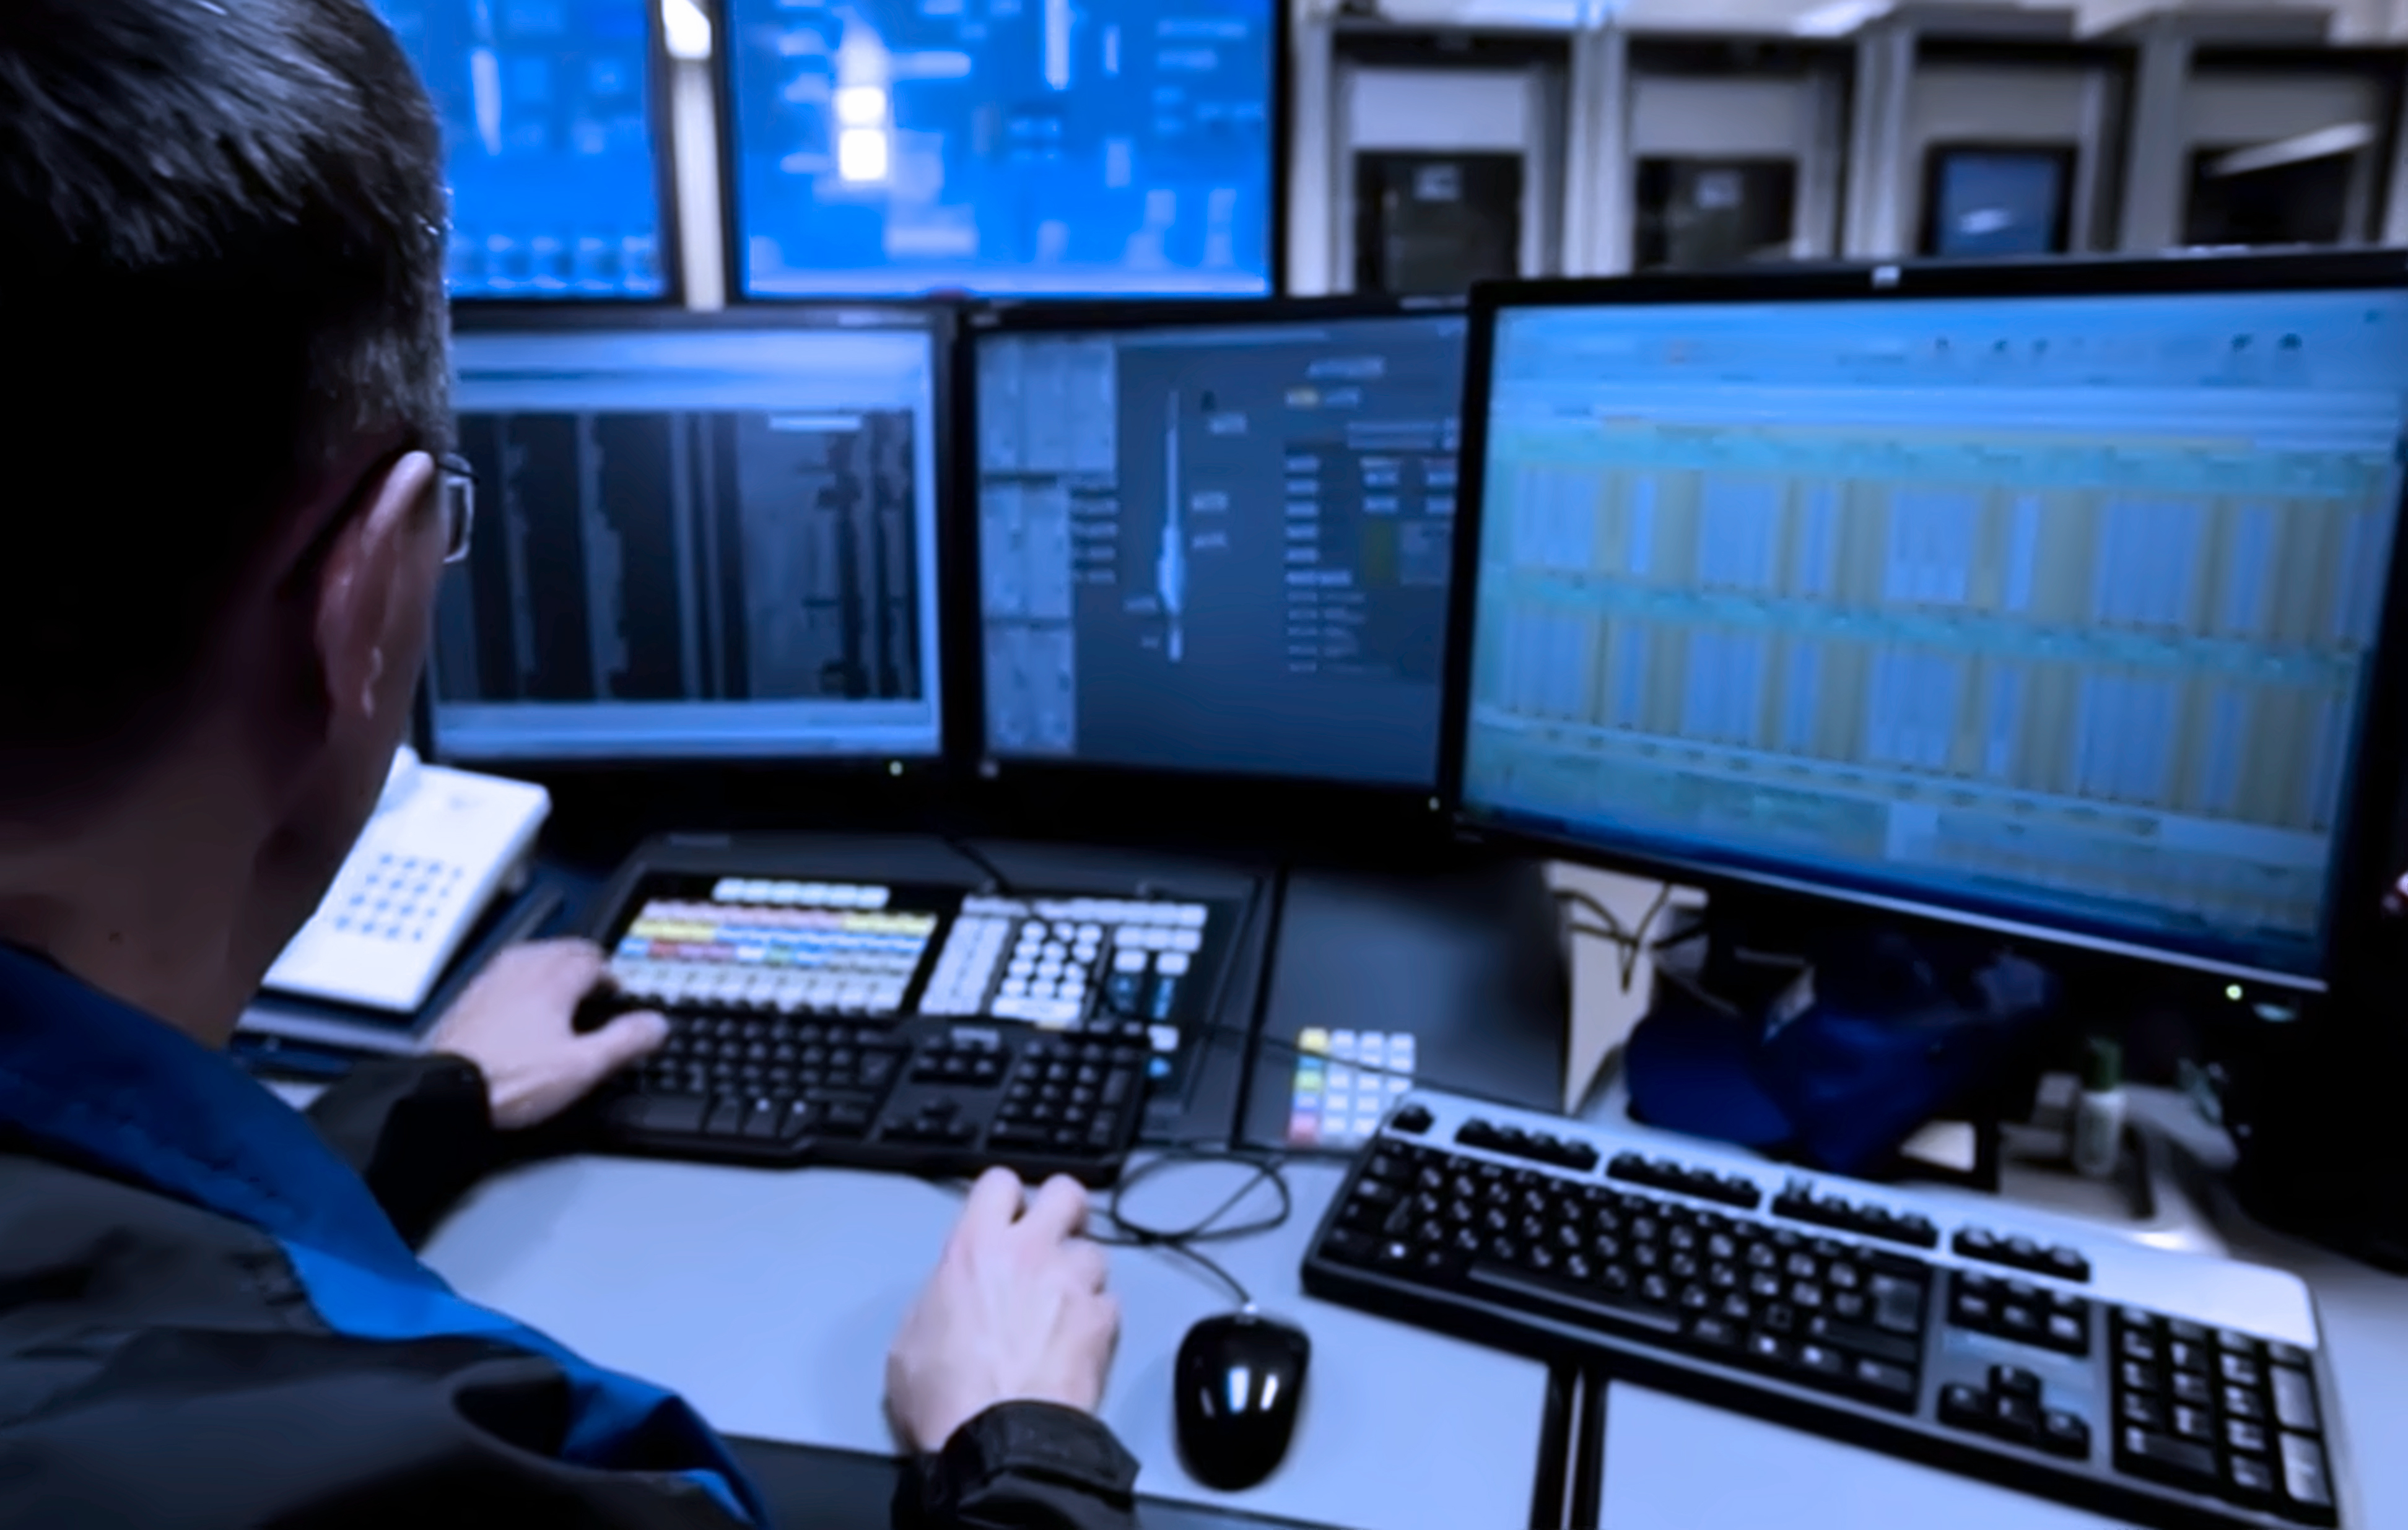 strumenti gestione industriale